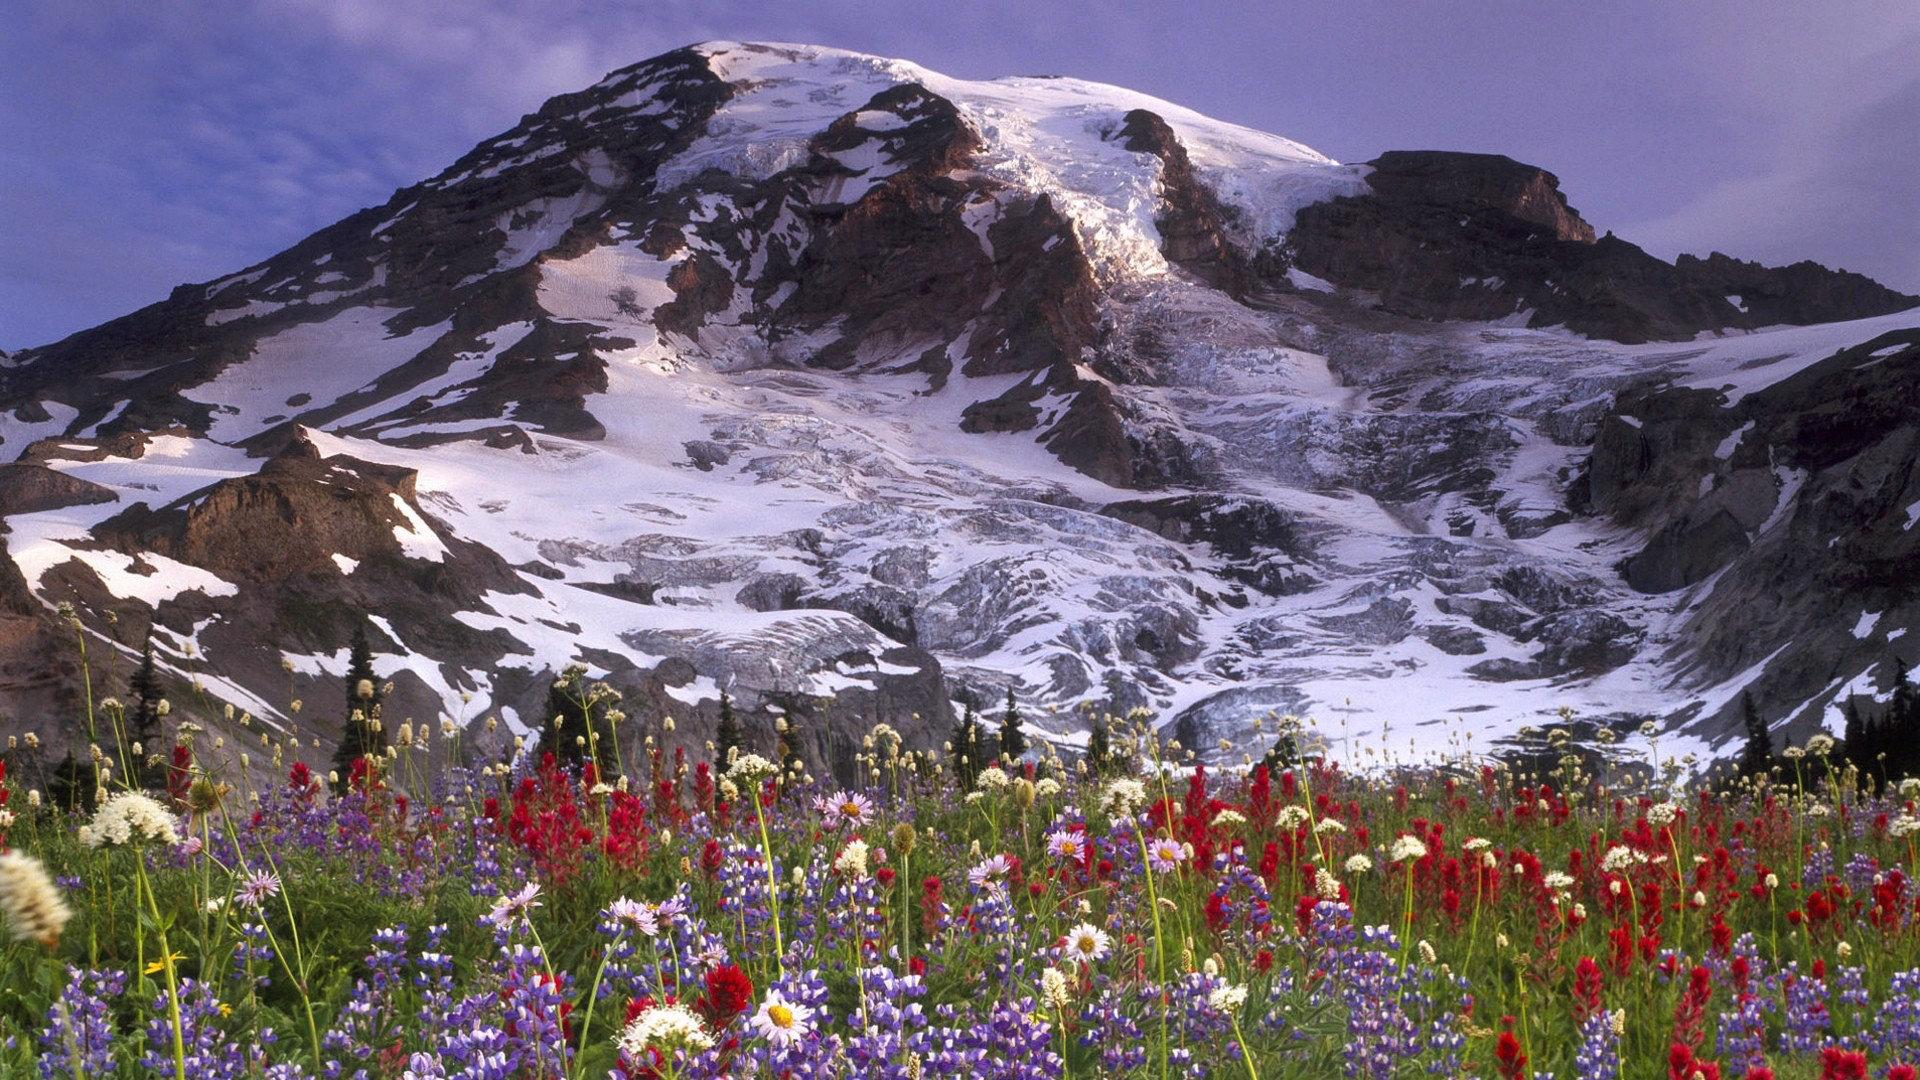 Best Mountain Wallpaper Id 177401 For High Resolution Hd 1920x1080 Computer